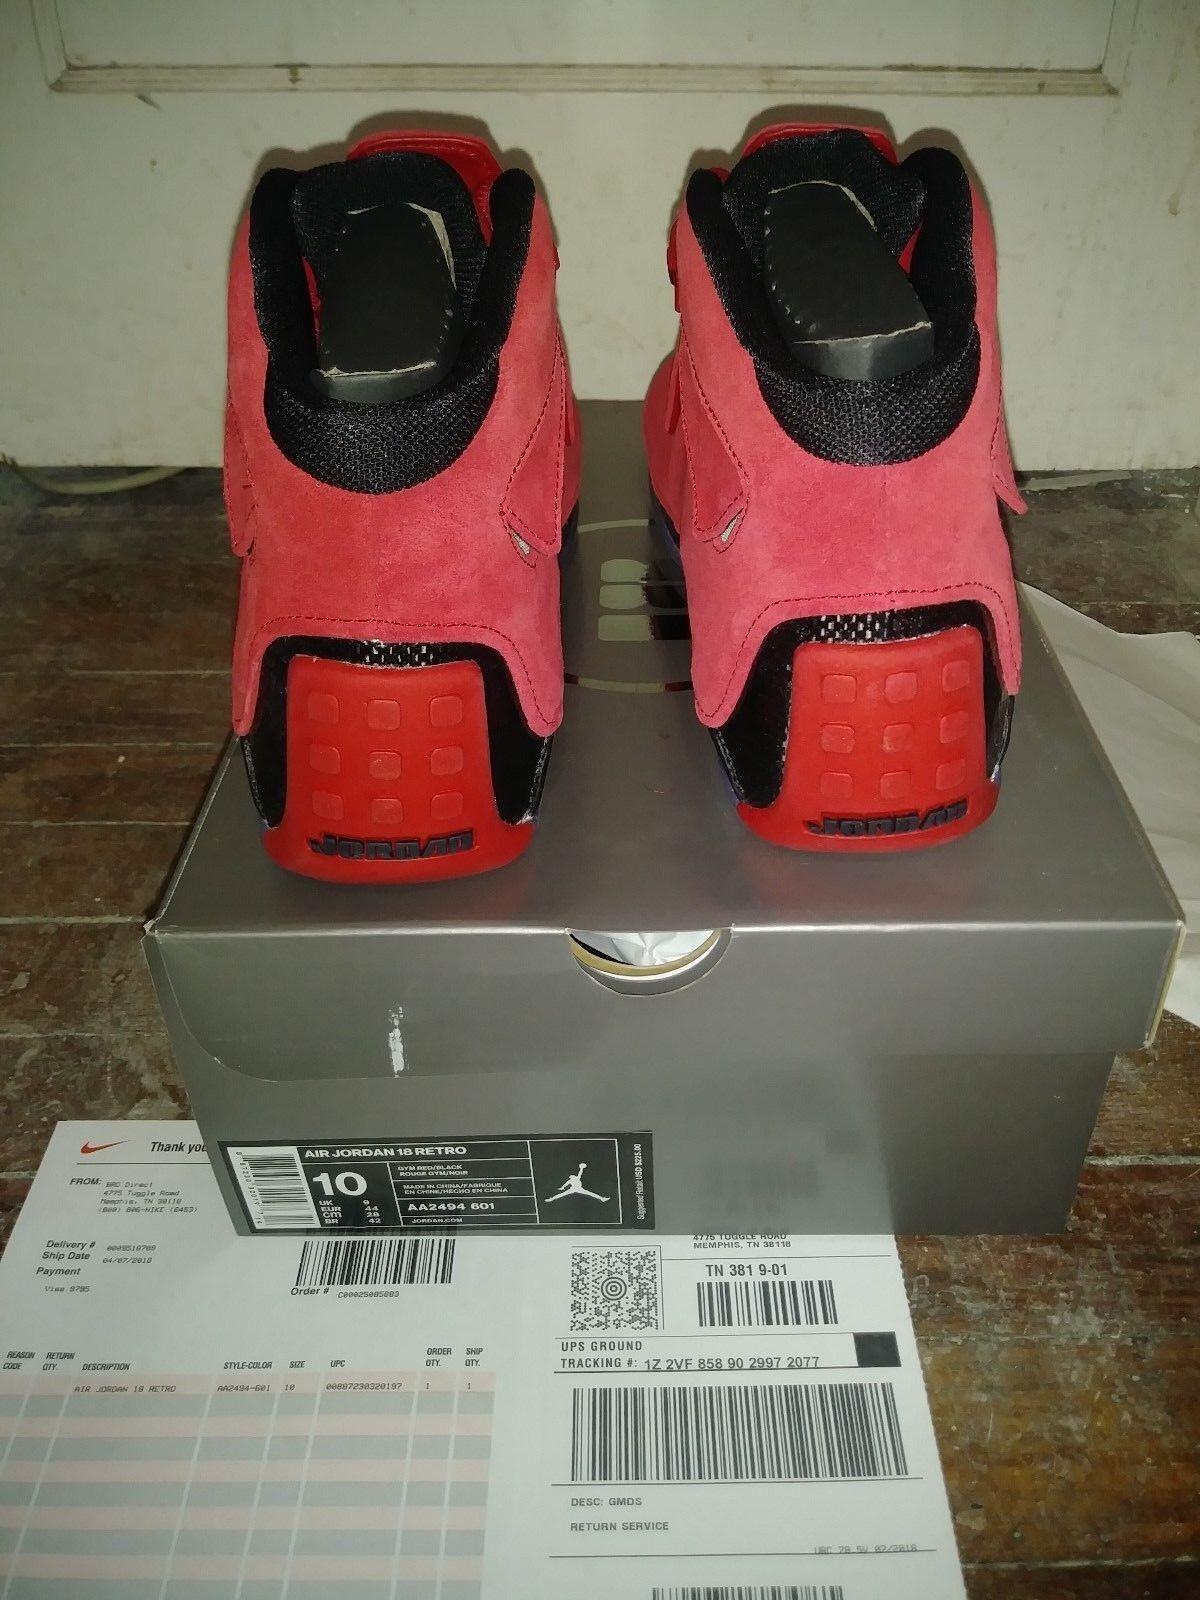 New Air Jordan 18 Retro Toro Gym Red Suede AA2494 601 Chicago Bulls Rare Limited Seasonal clearance sale